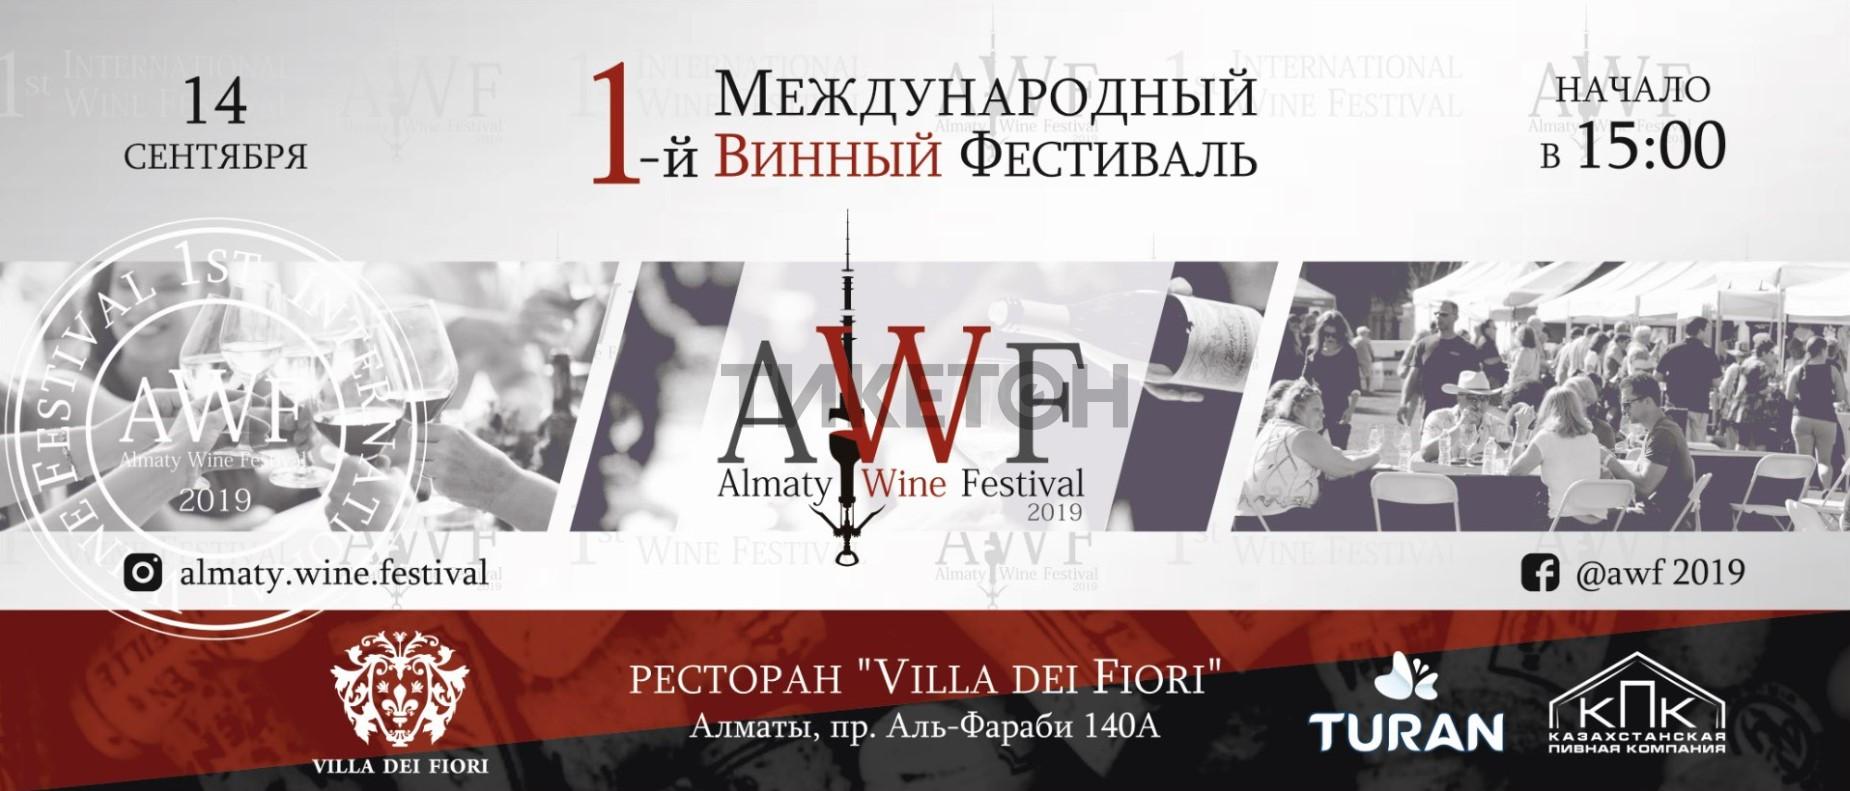 almaty-wine-festival-2019